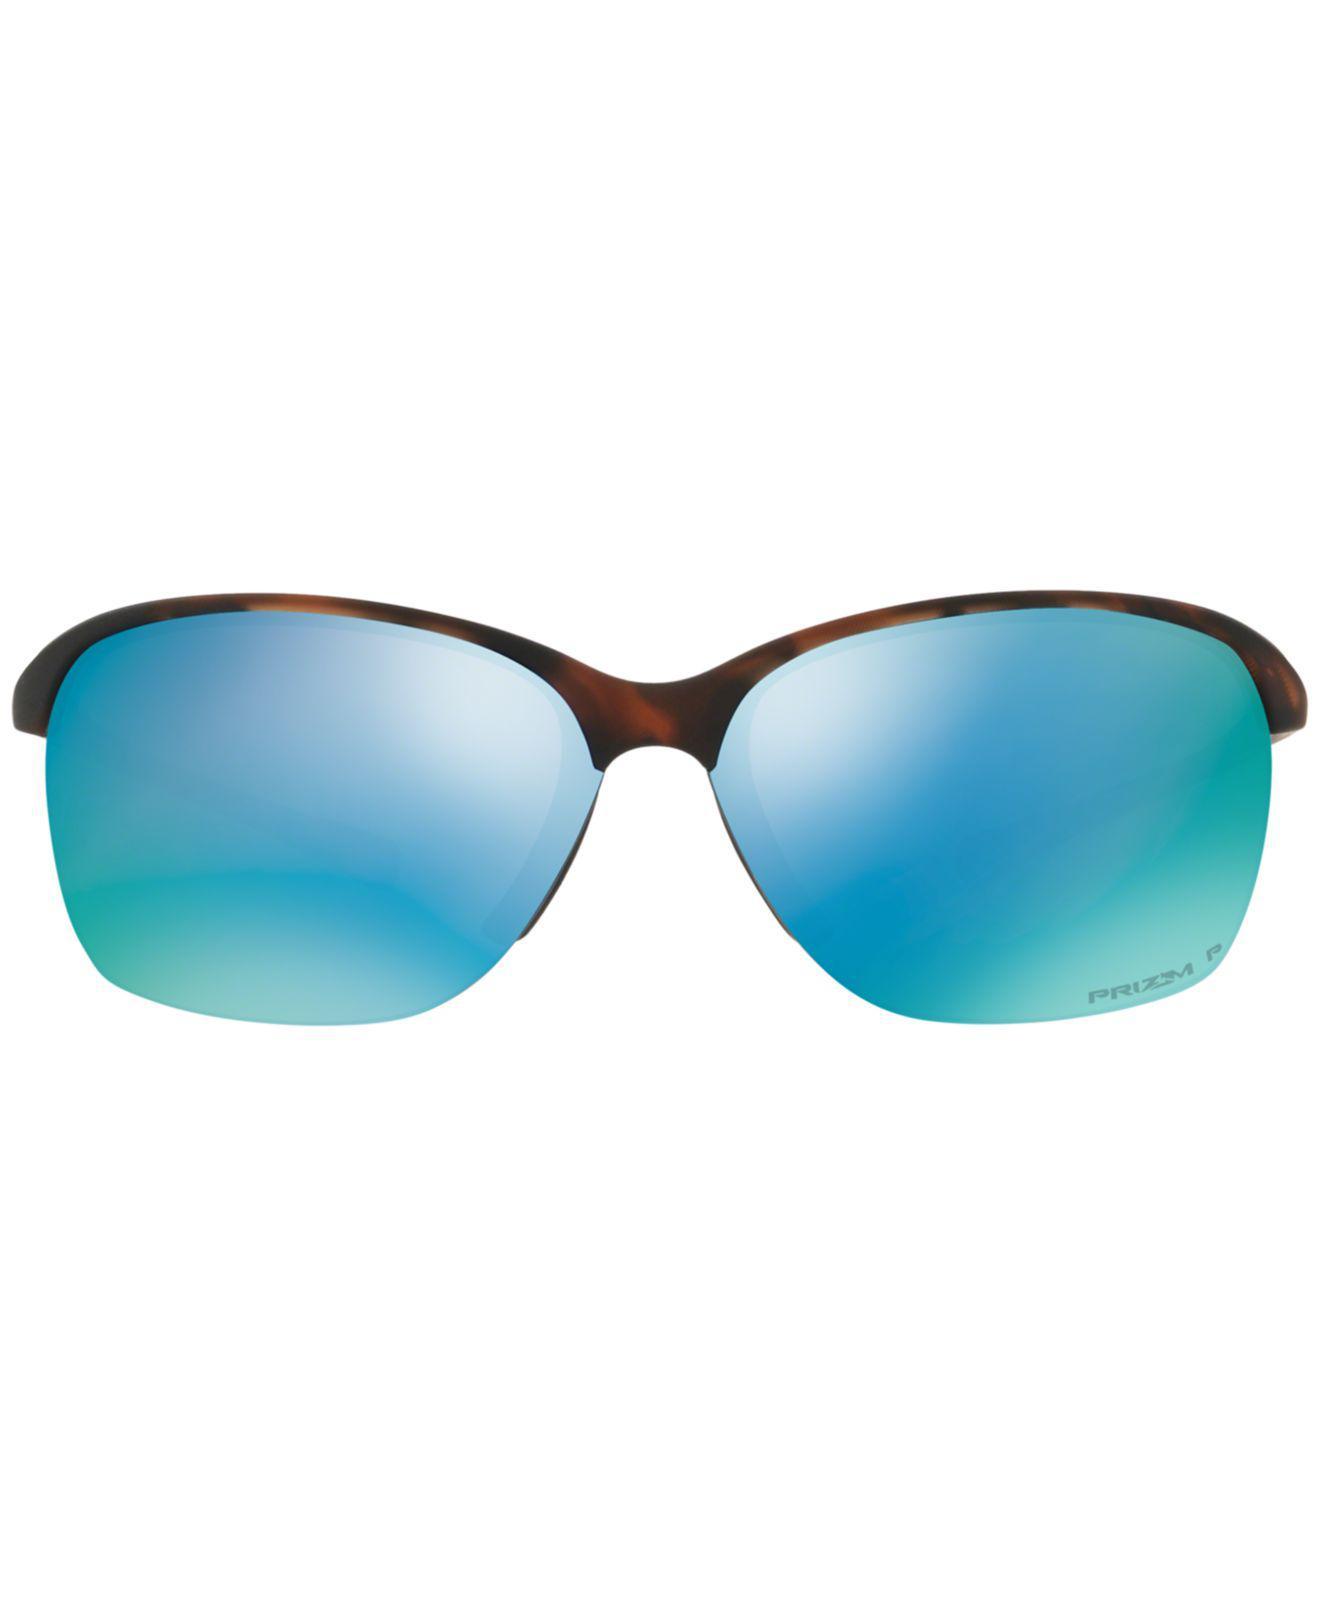 988a6b3d10 Lyst - Oakley Polarized Sunglasses